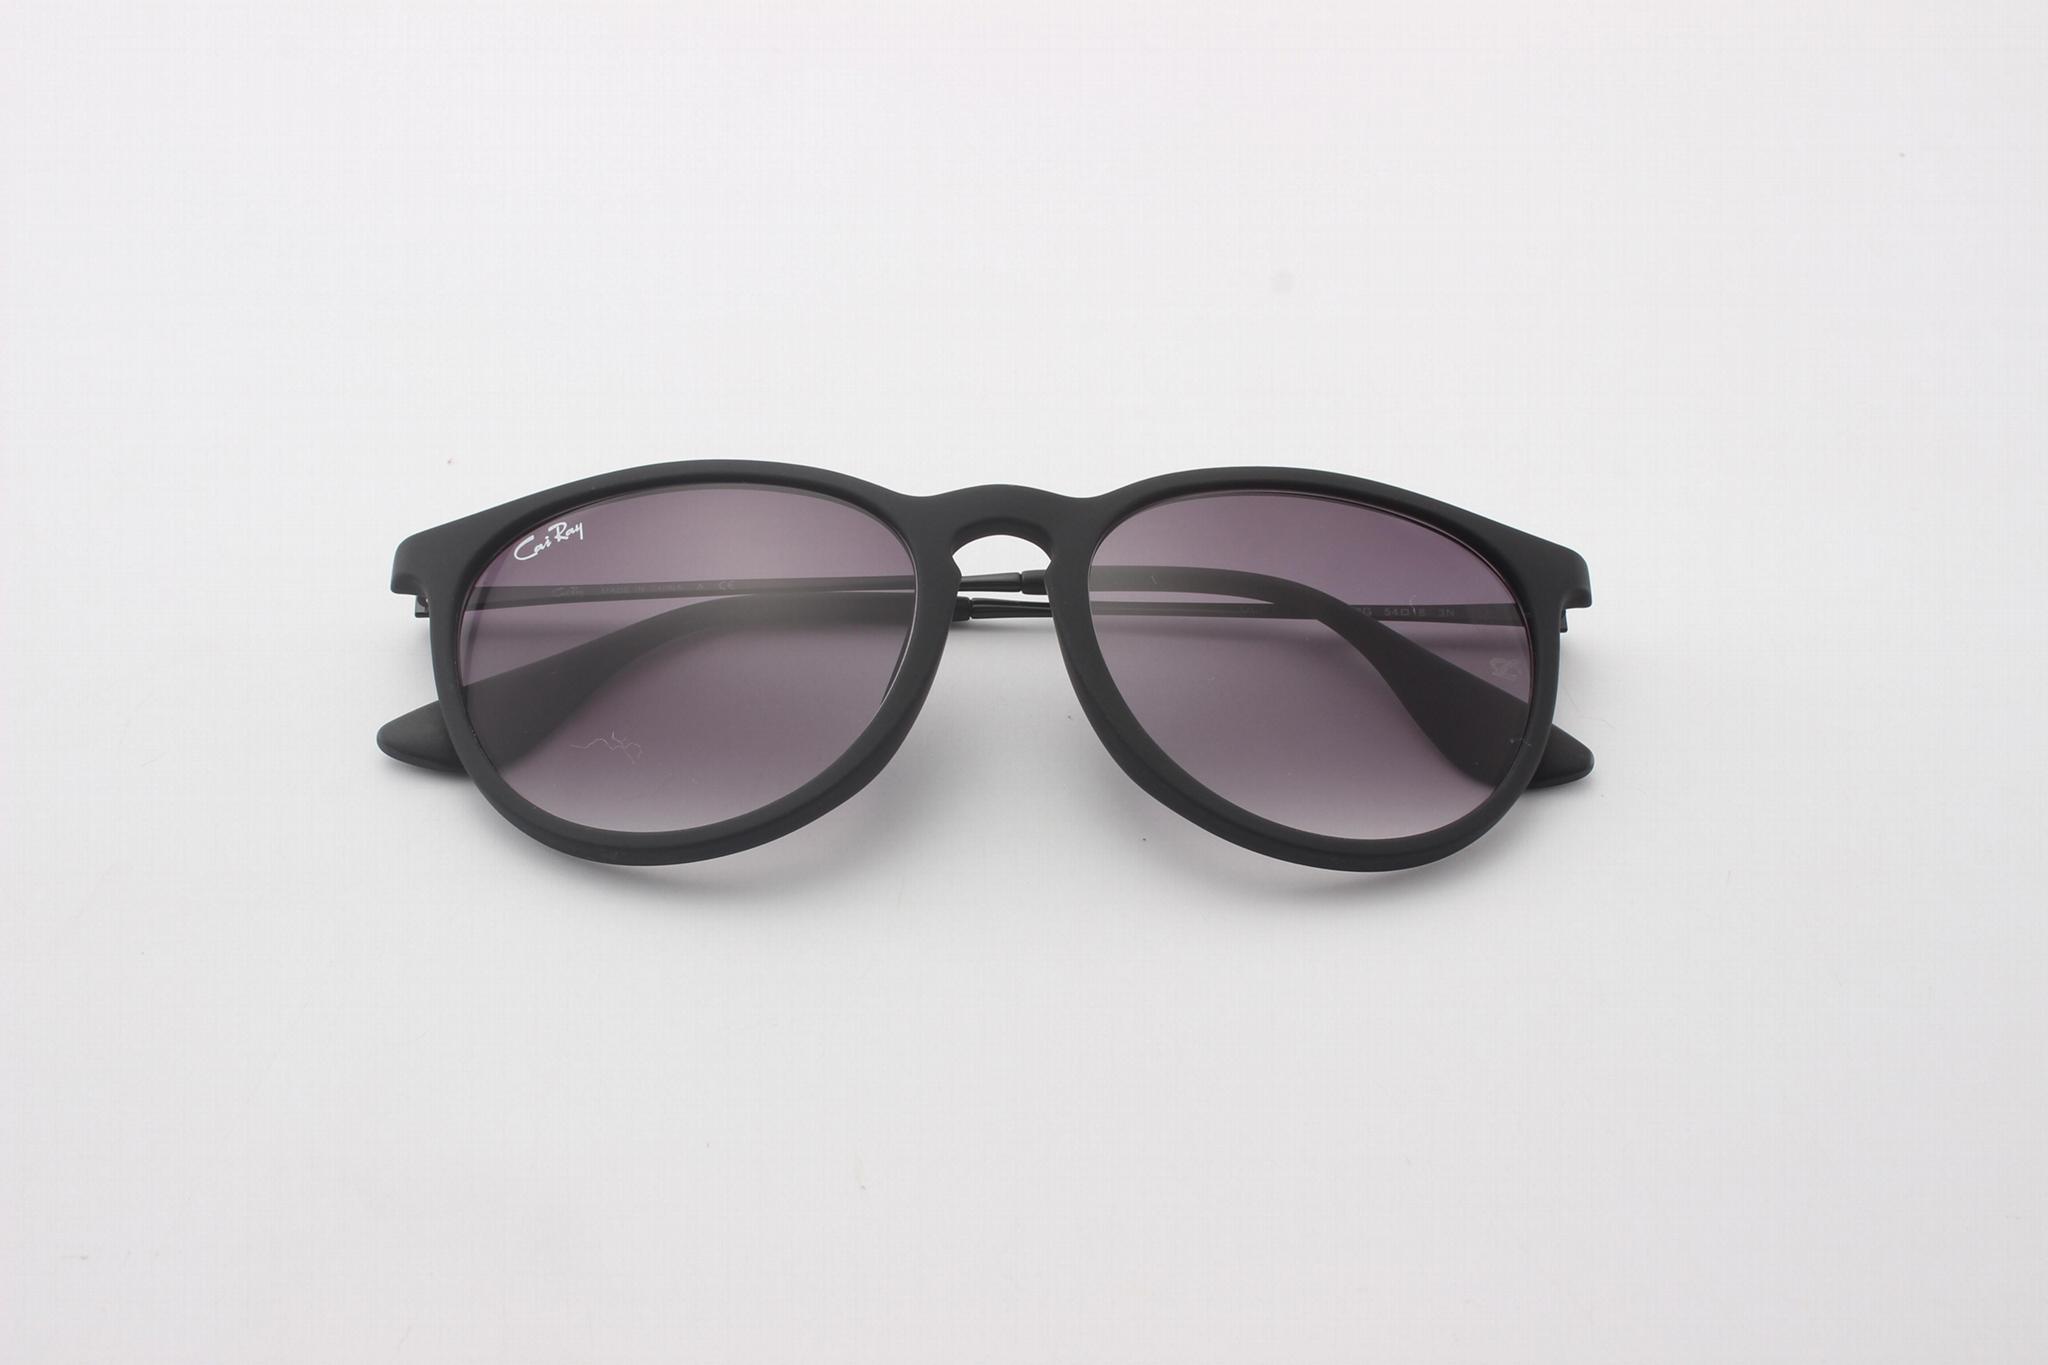 Cai Ray original Erika sunglasses OCR4171 622/8G black/gradient gray lens 54mm